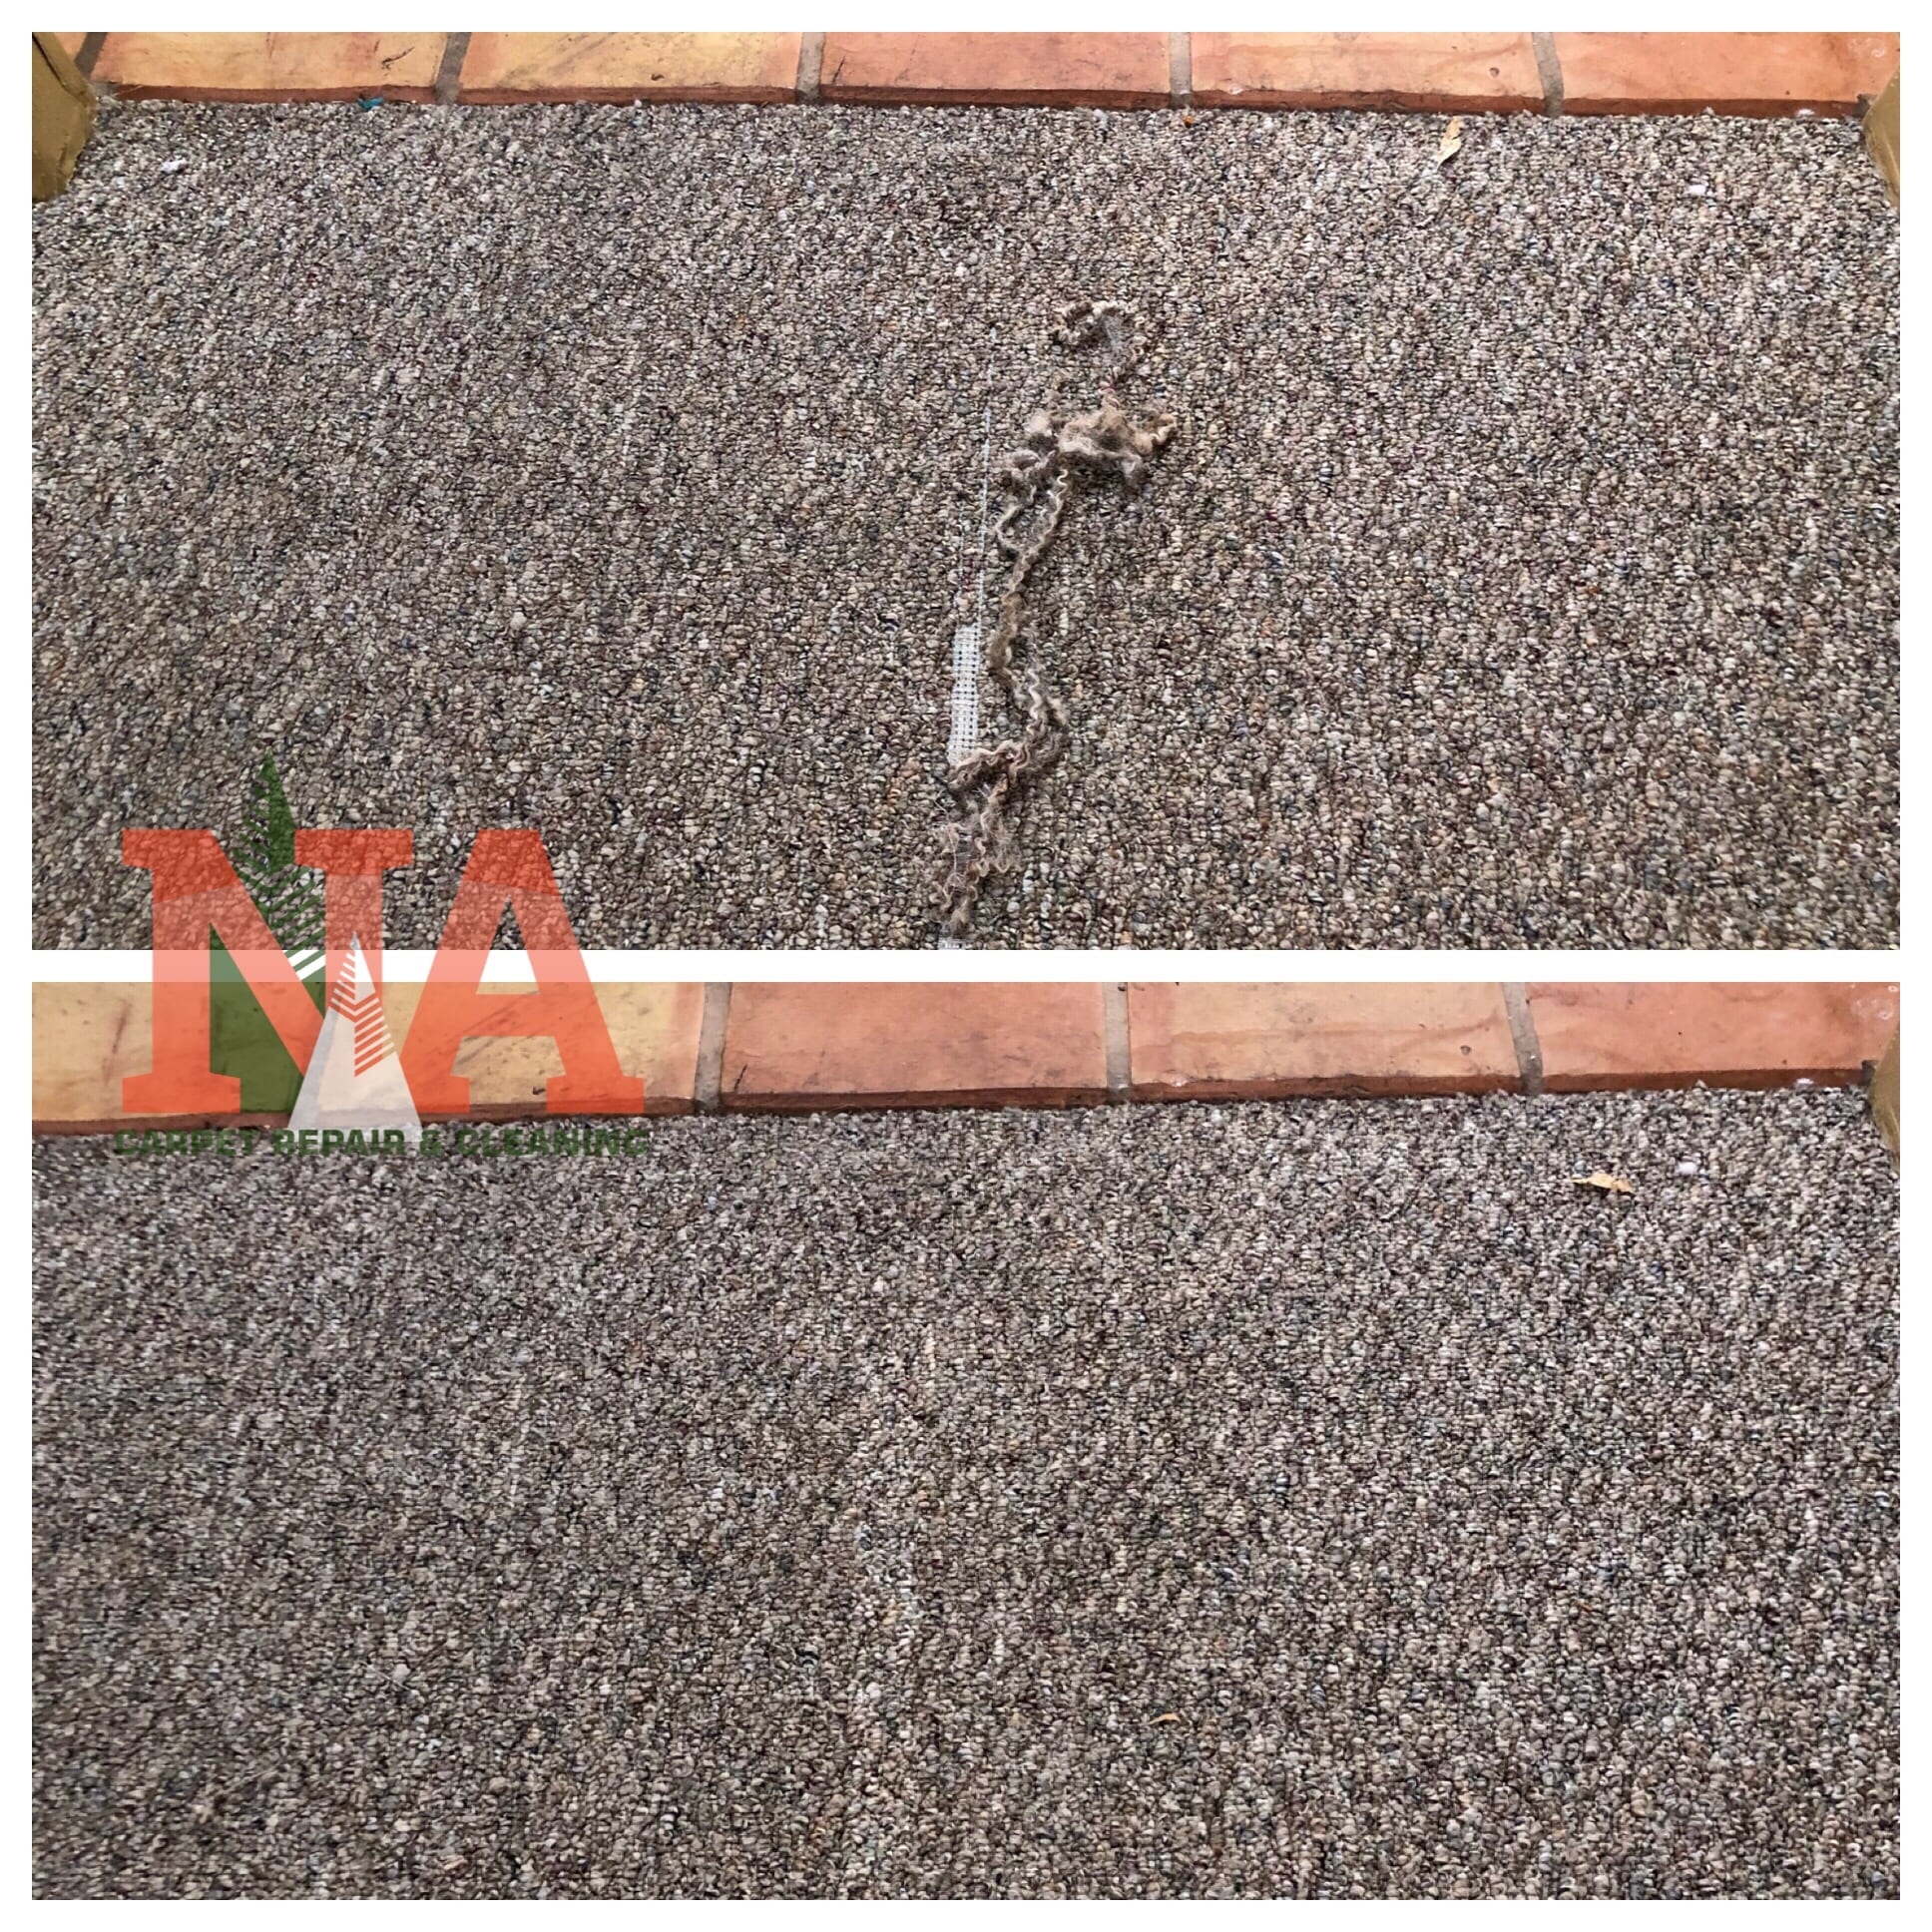 Sedona Carpet Repair